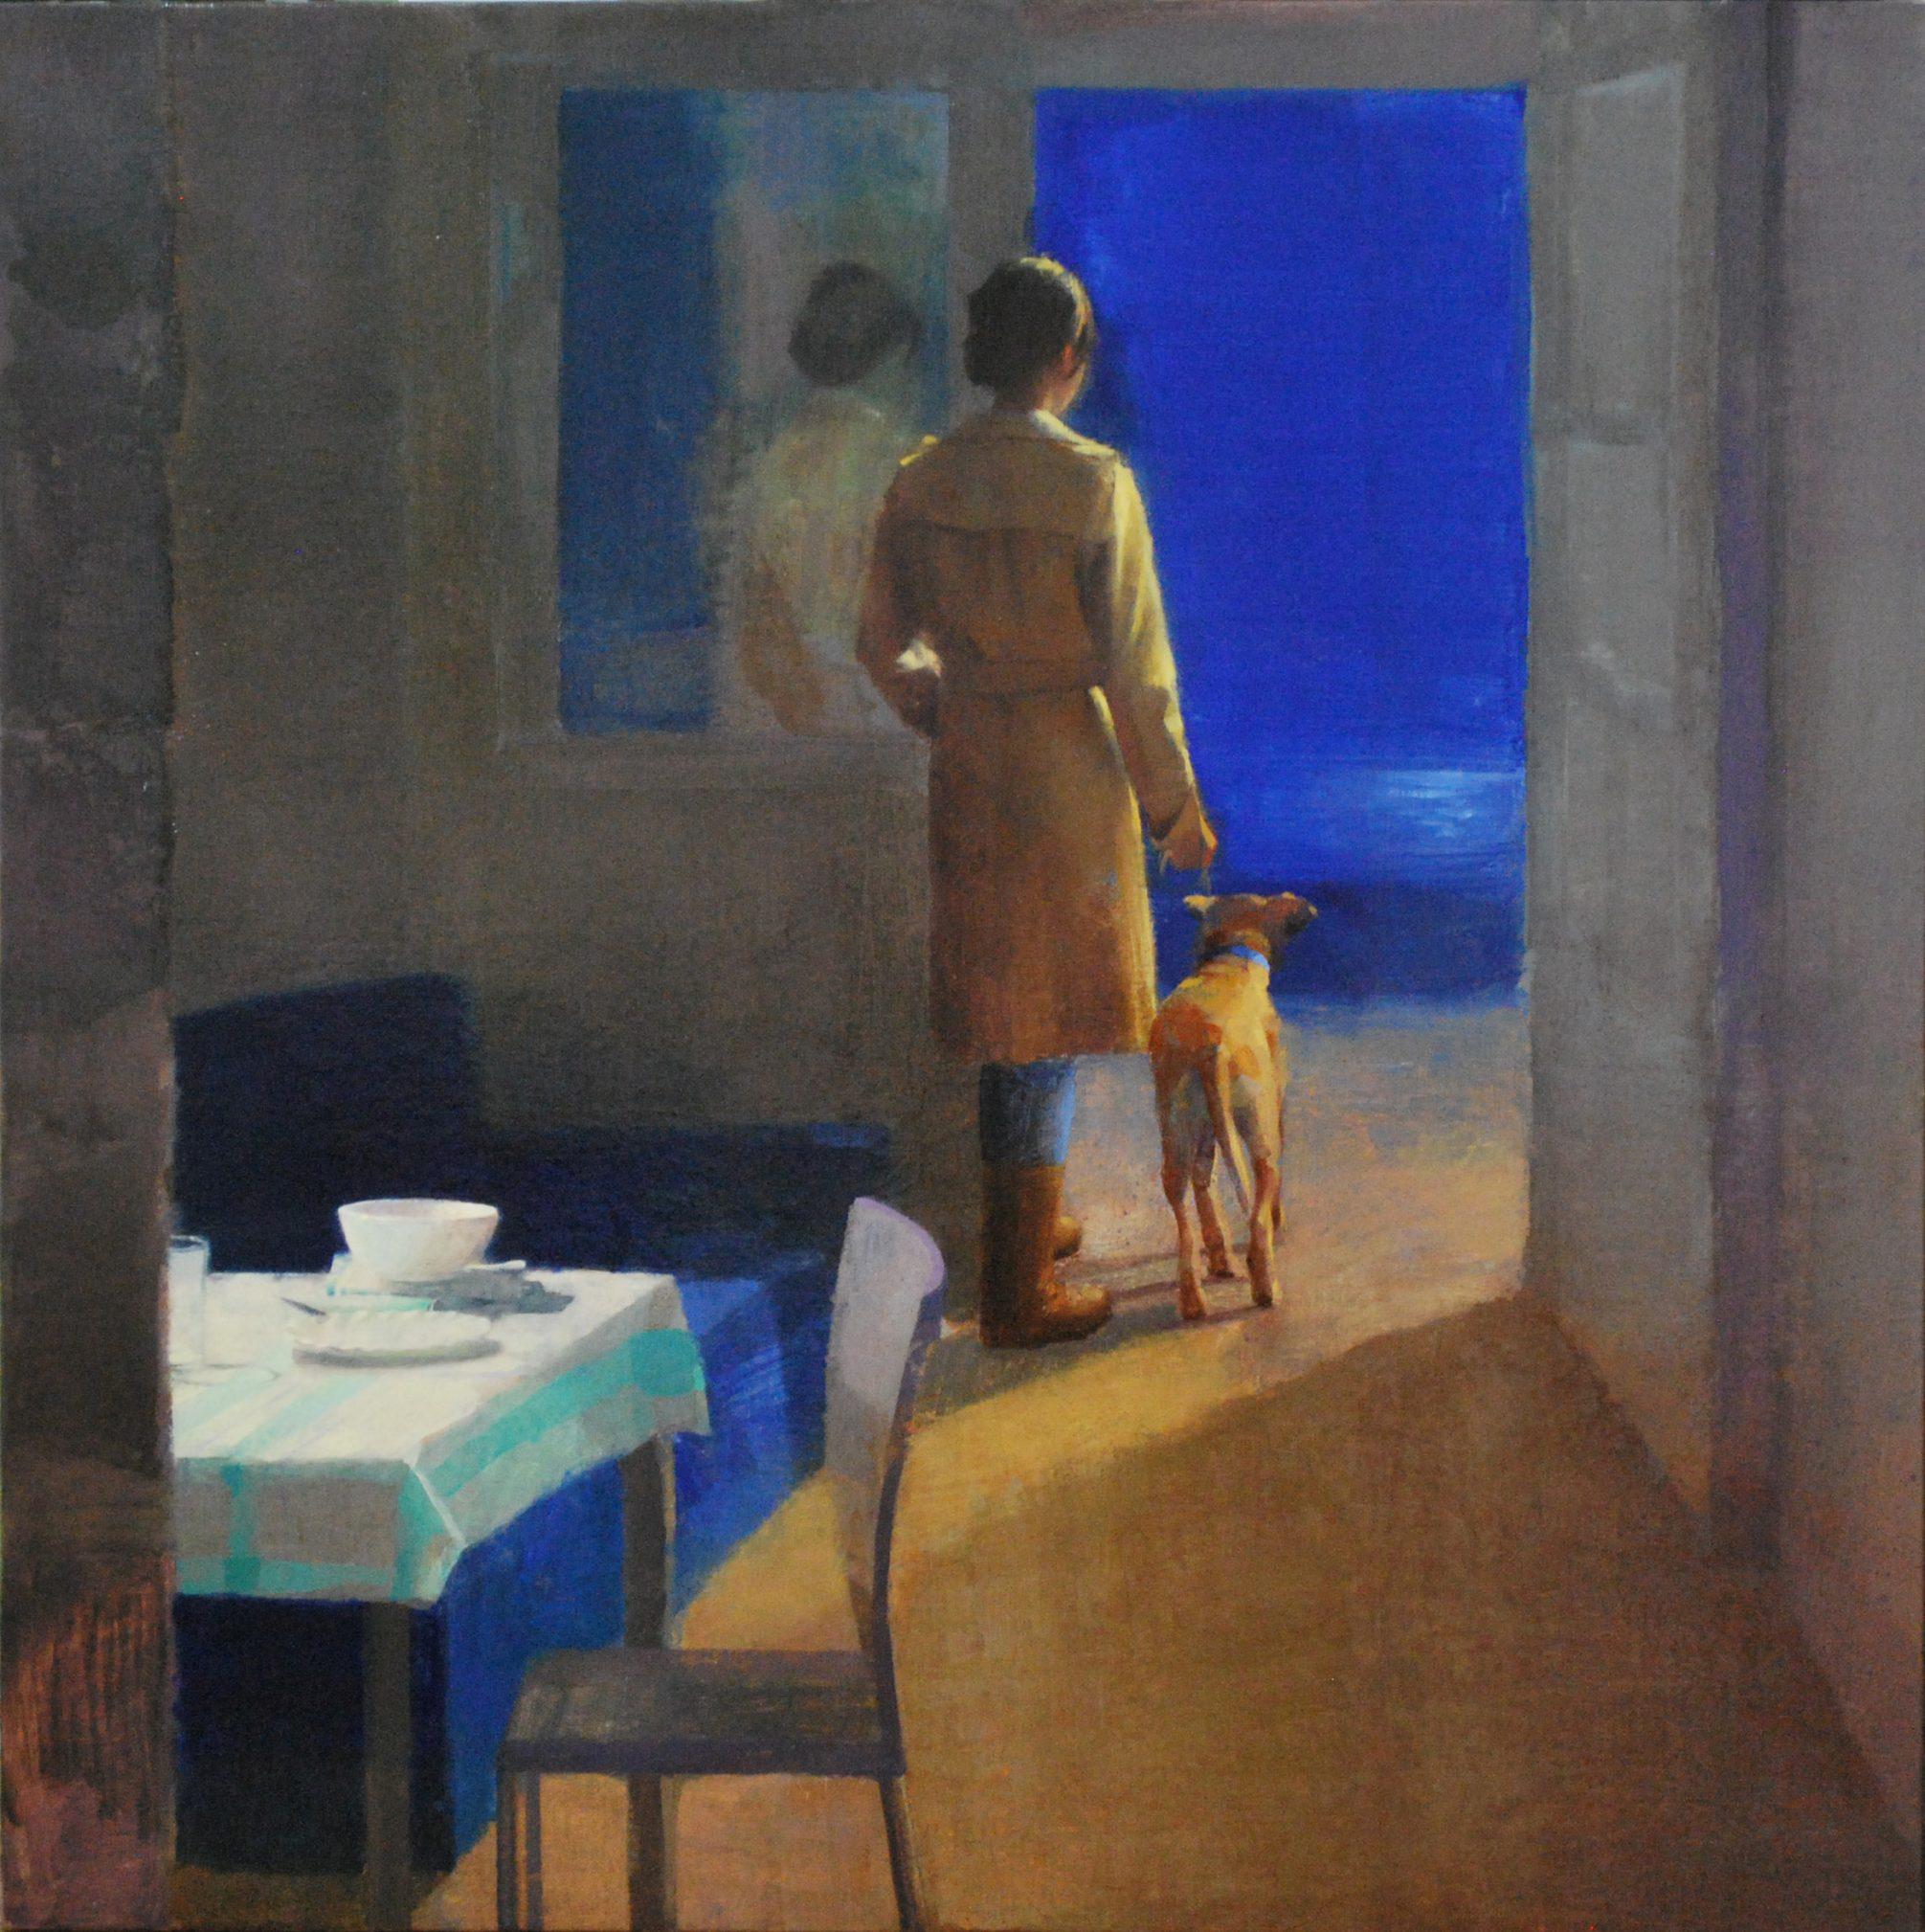 hora-del-paseo-alejandra-caballero-oleo-interior-mujer-saca-pasear-perro-noche-mar-mesa-luz